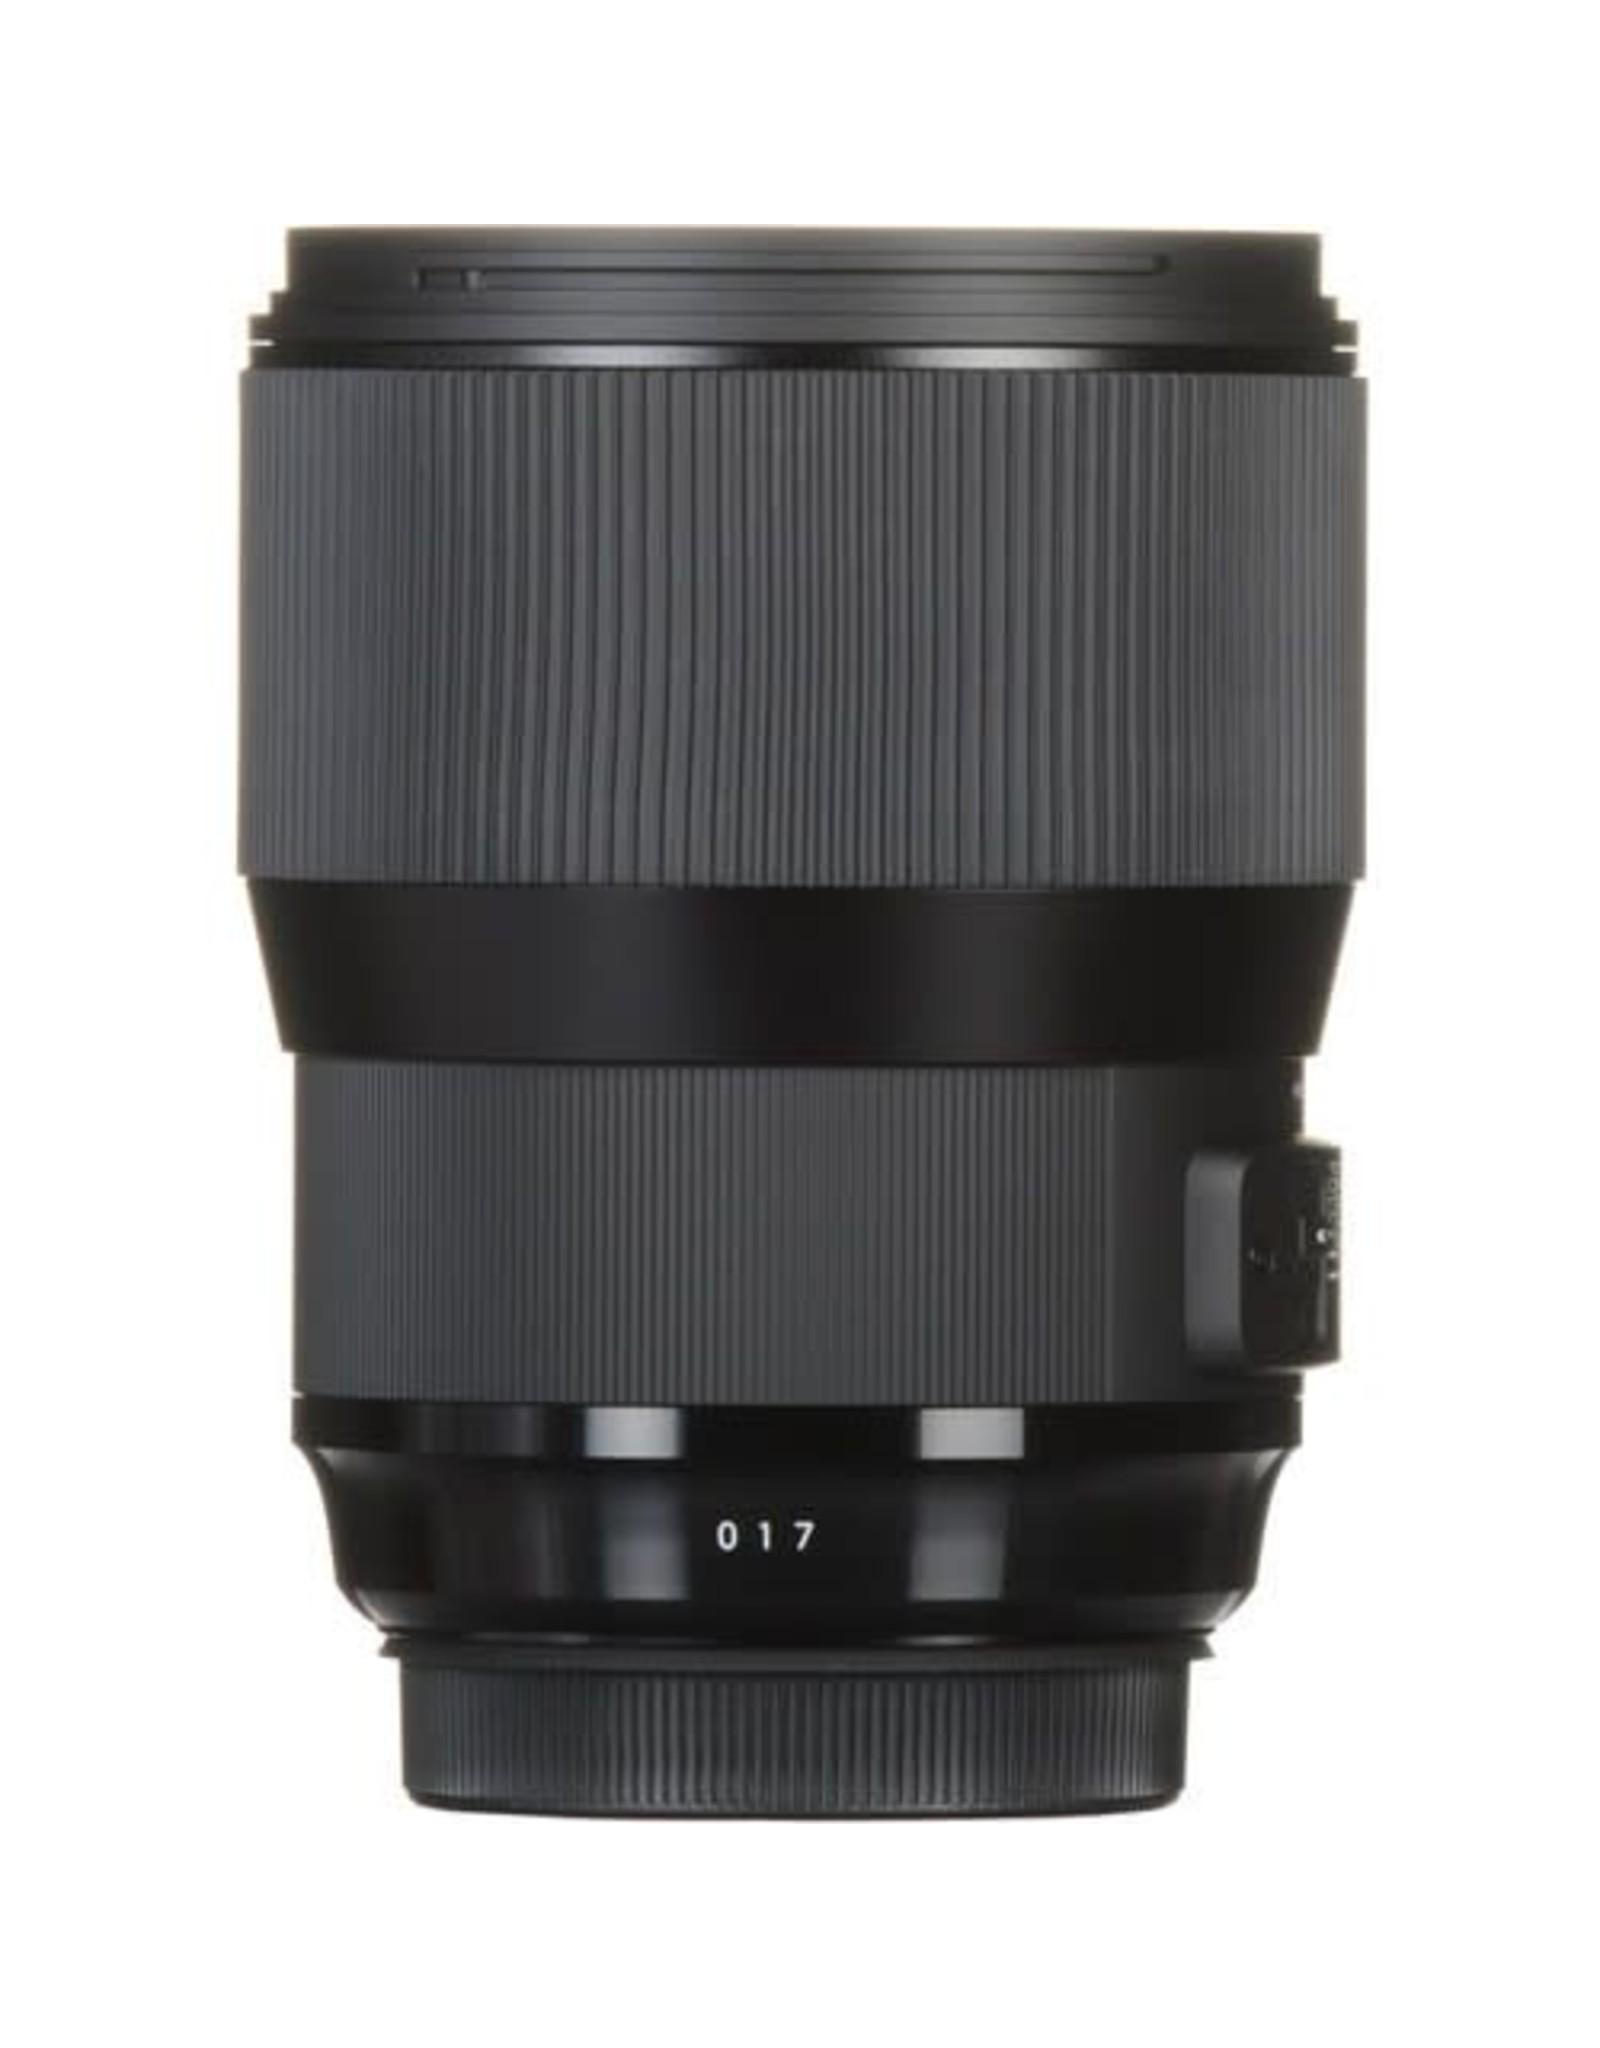 Sigma Sigma 135mm f1.8 Art DG HSM